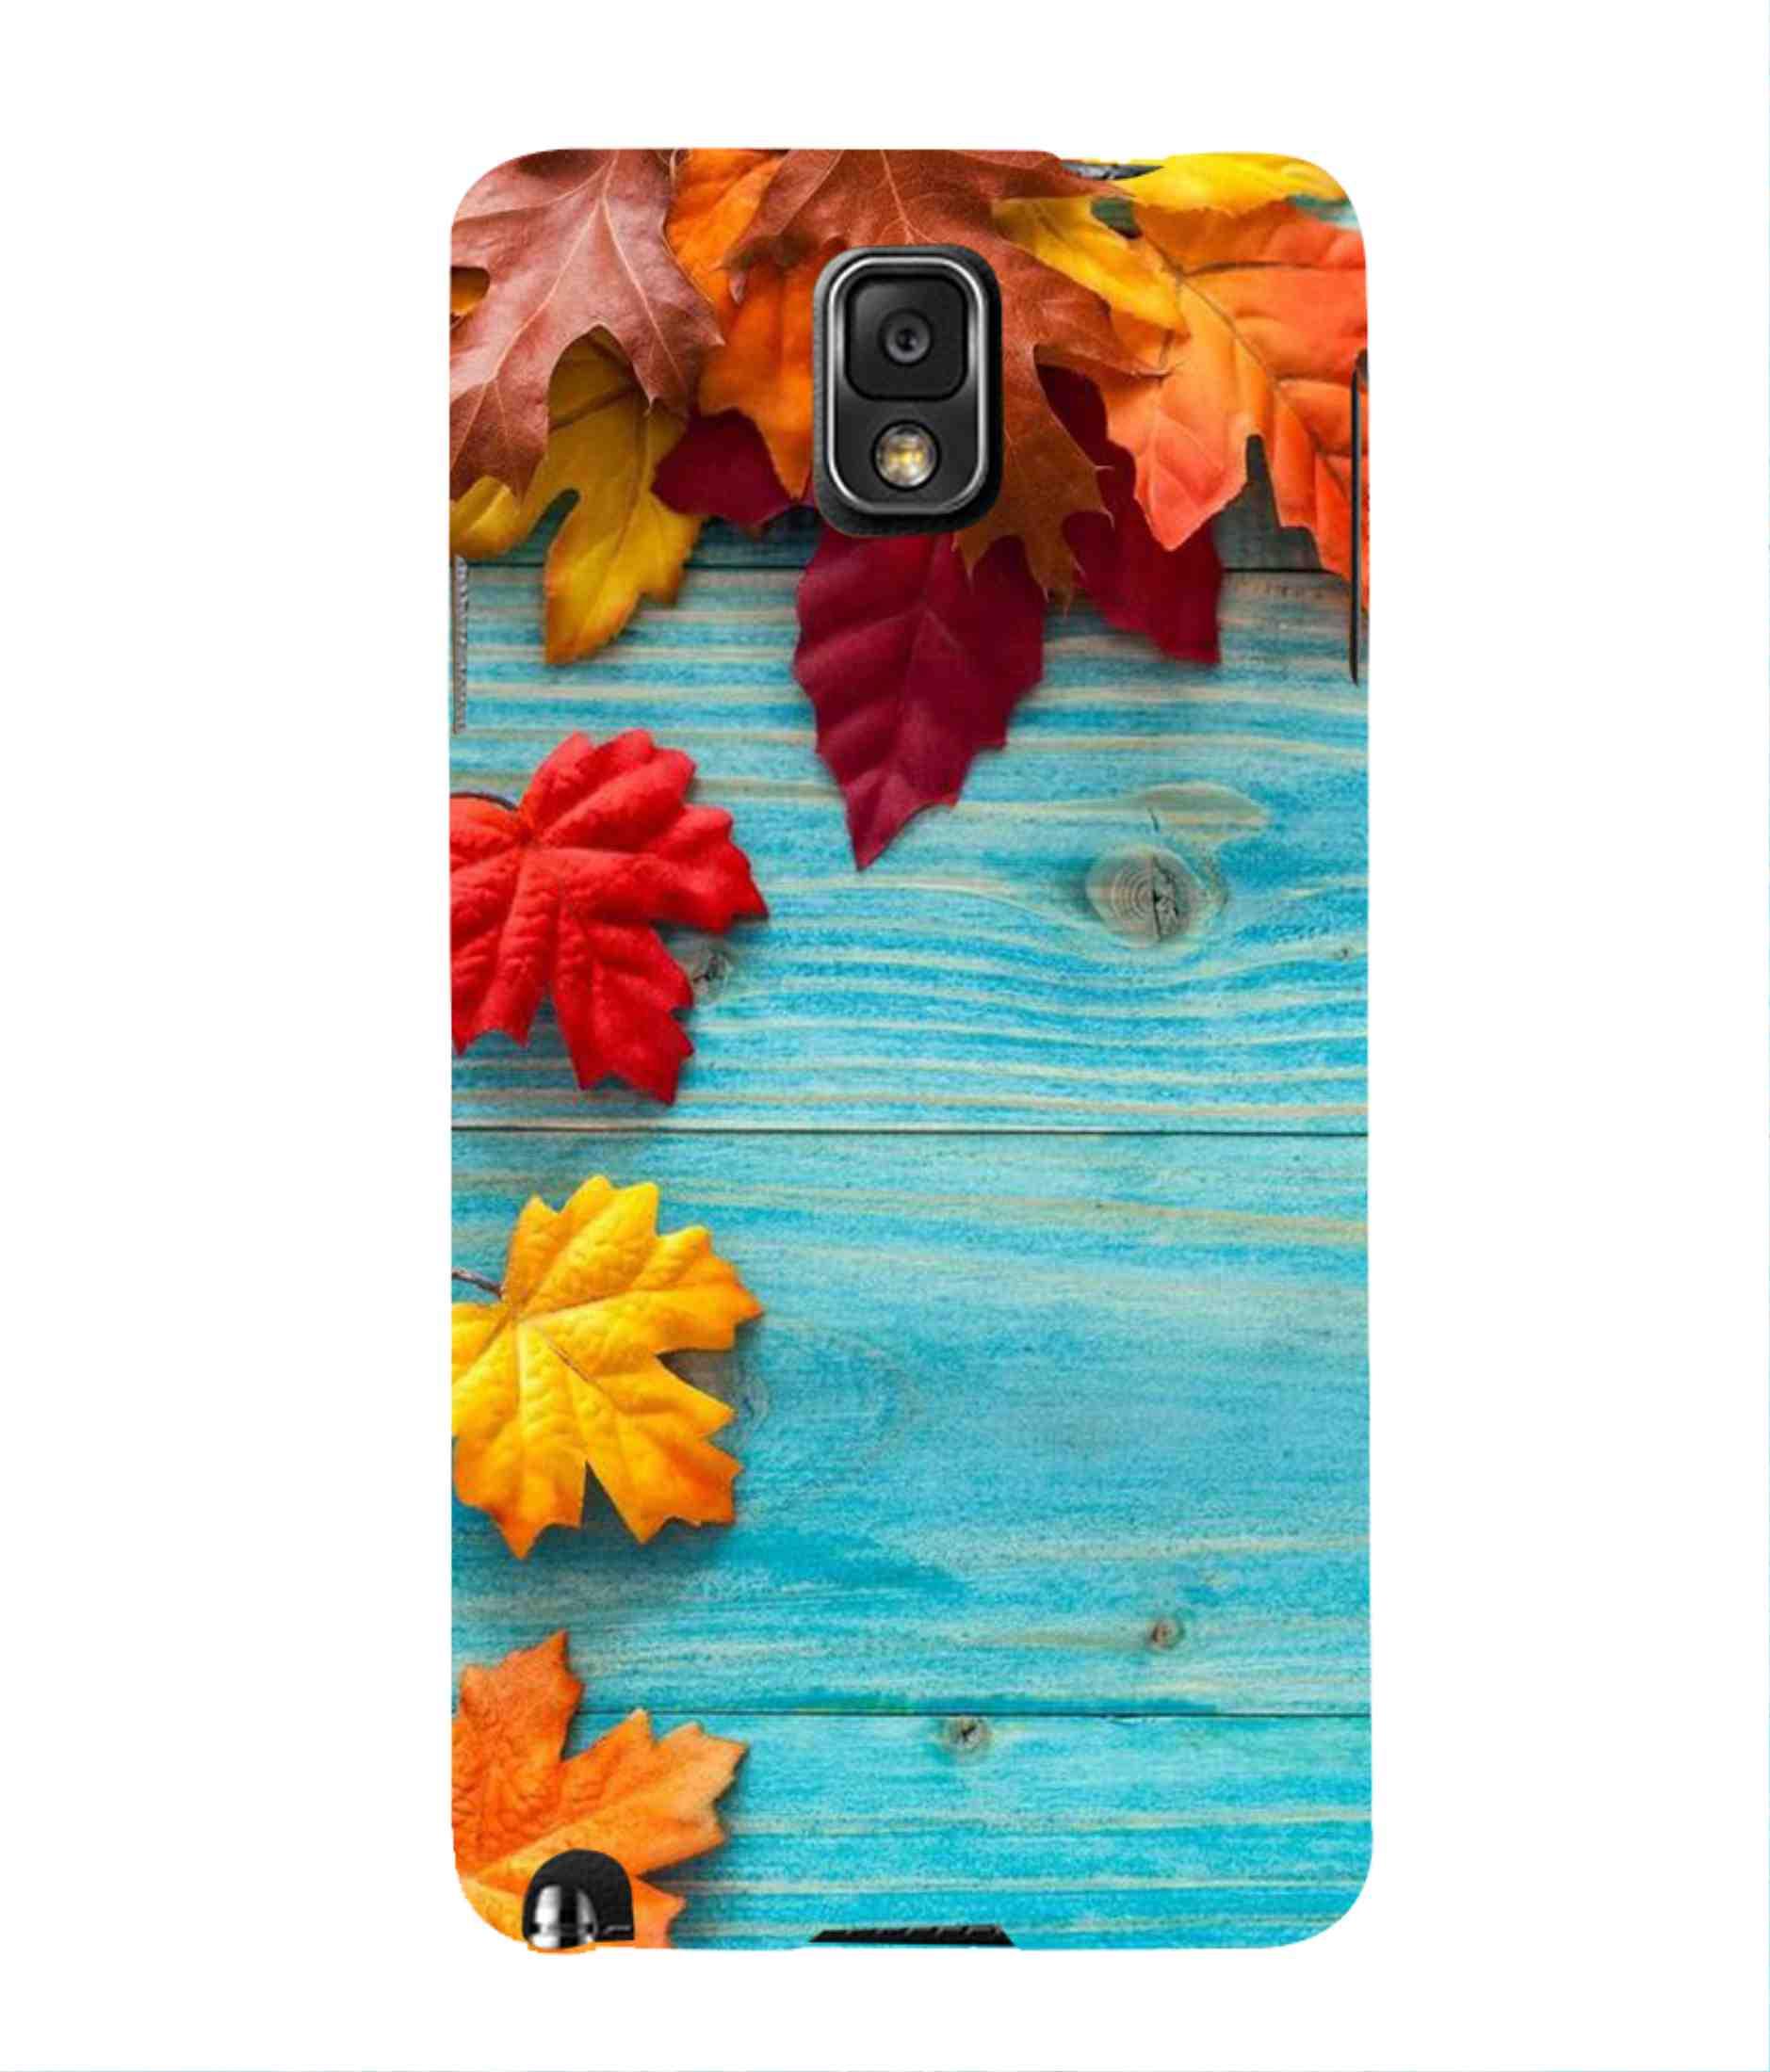 Vibrante Mobile Case Cover For Samsung Galaxy Note 3 , Samsung Galaxy Note Iii , Samsung Galaxy Note 3 N9002 , Samsung Galaxy Note N9000 N9005 28847